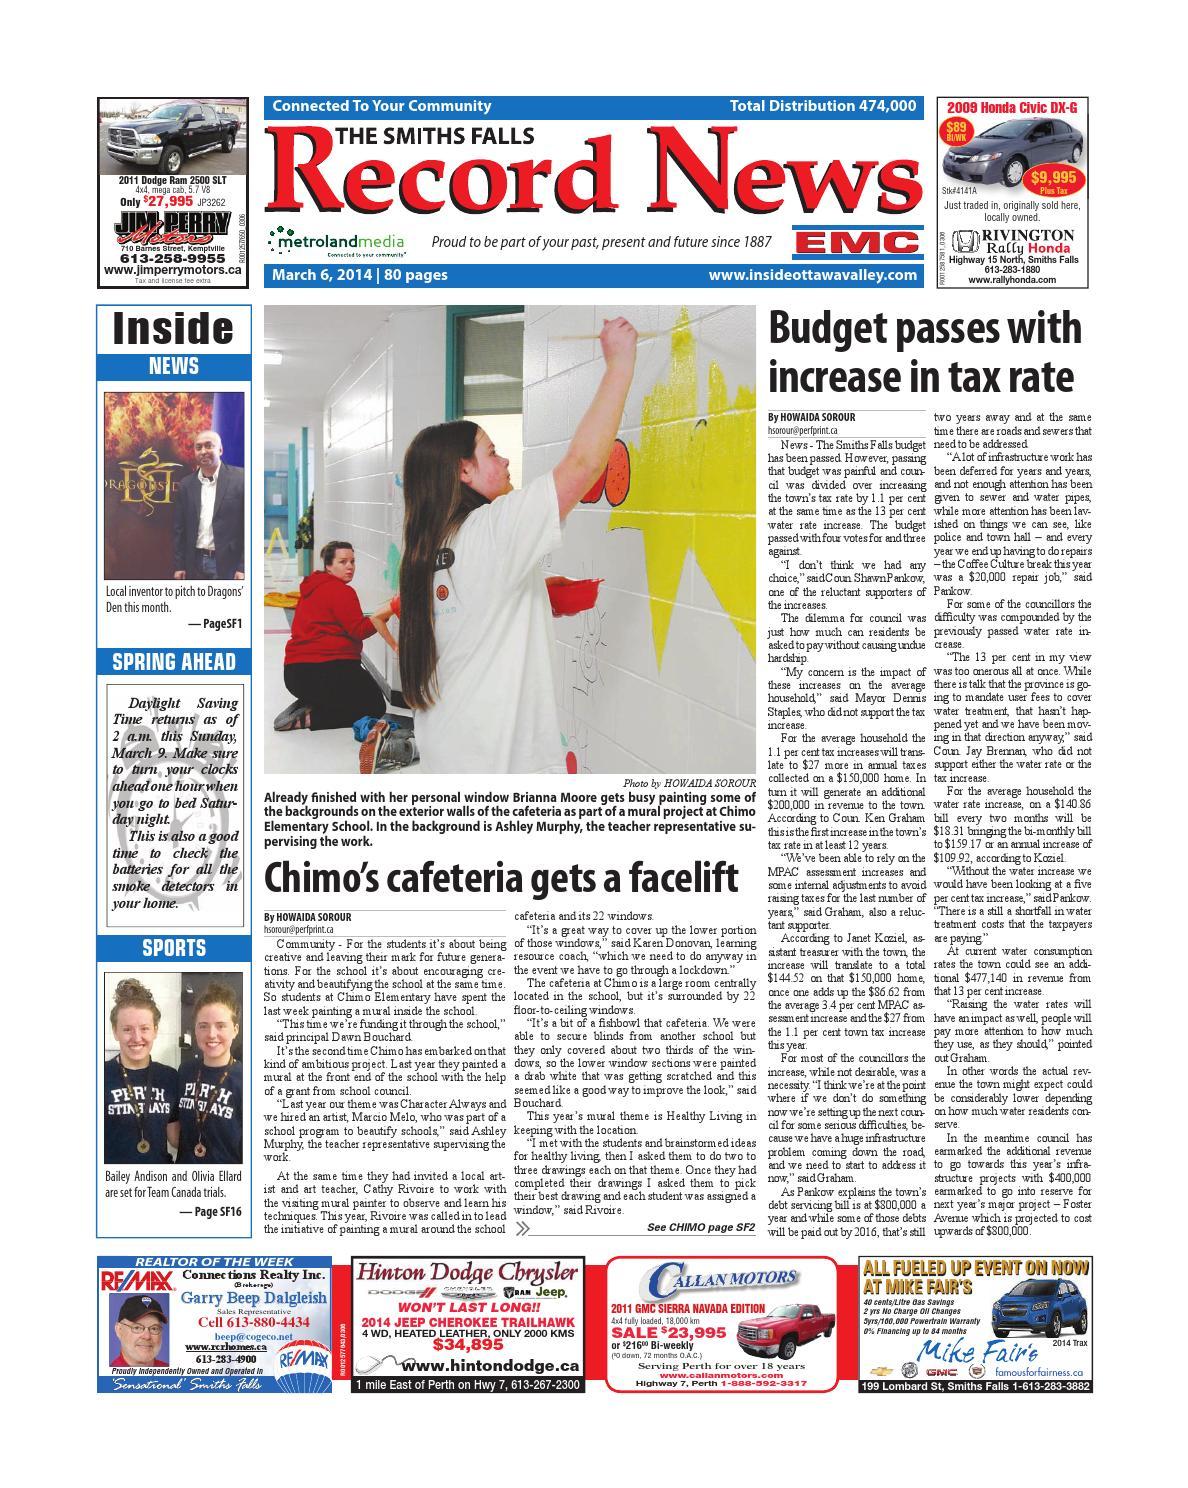 2e2ecd60ca9332 Smithsfalls030614 by Metroland East - Smiths Falls Record News - issuu